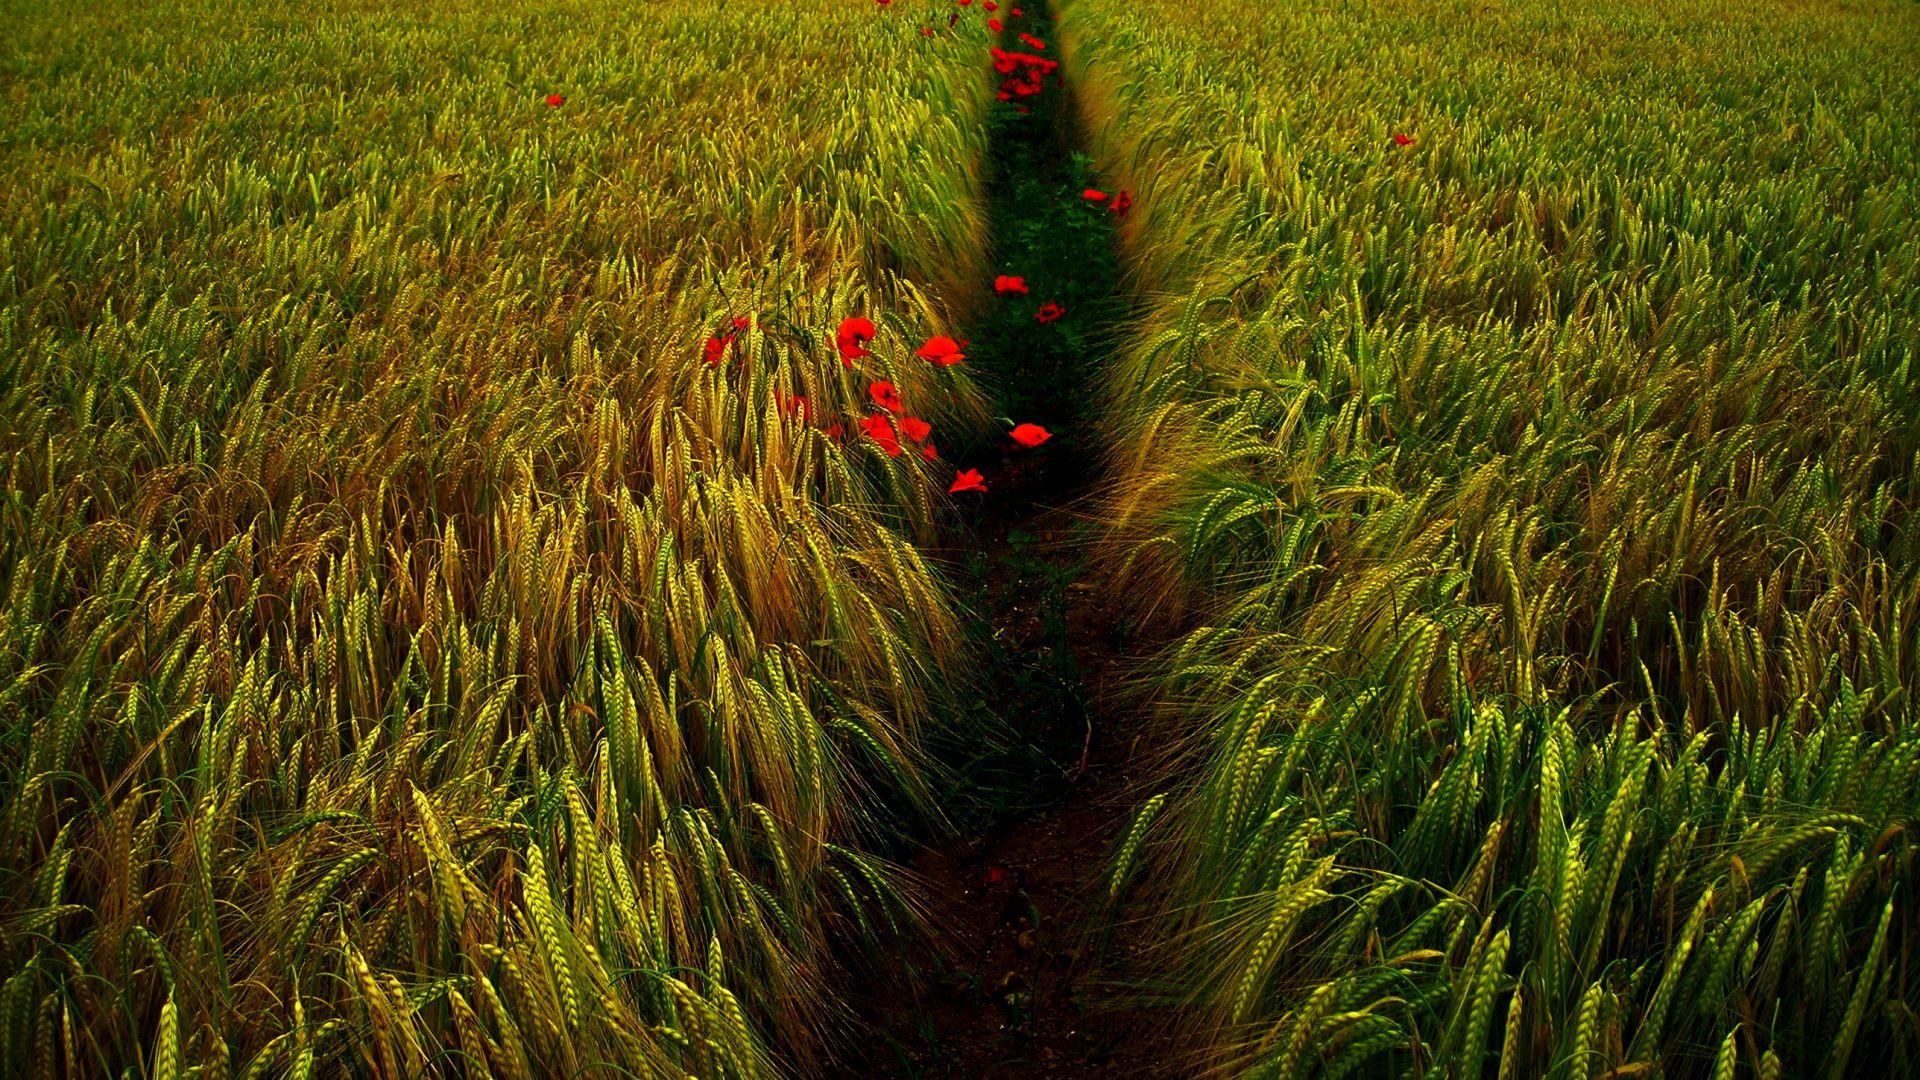 Wheat field, green grass field